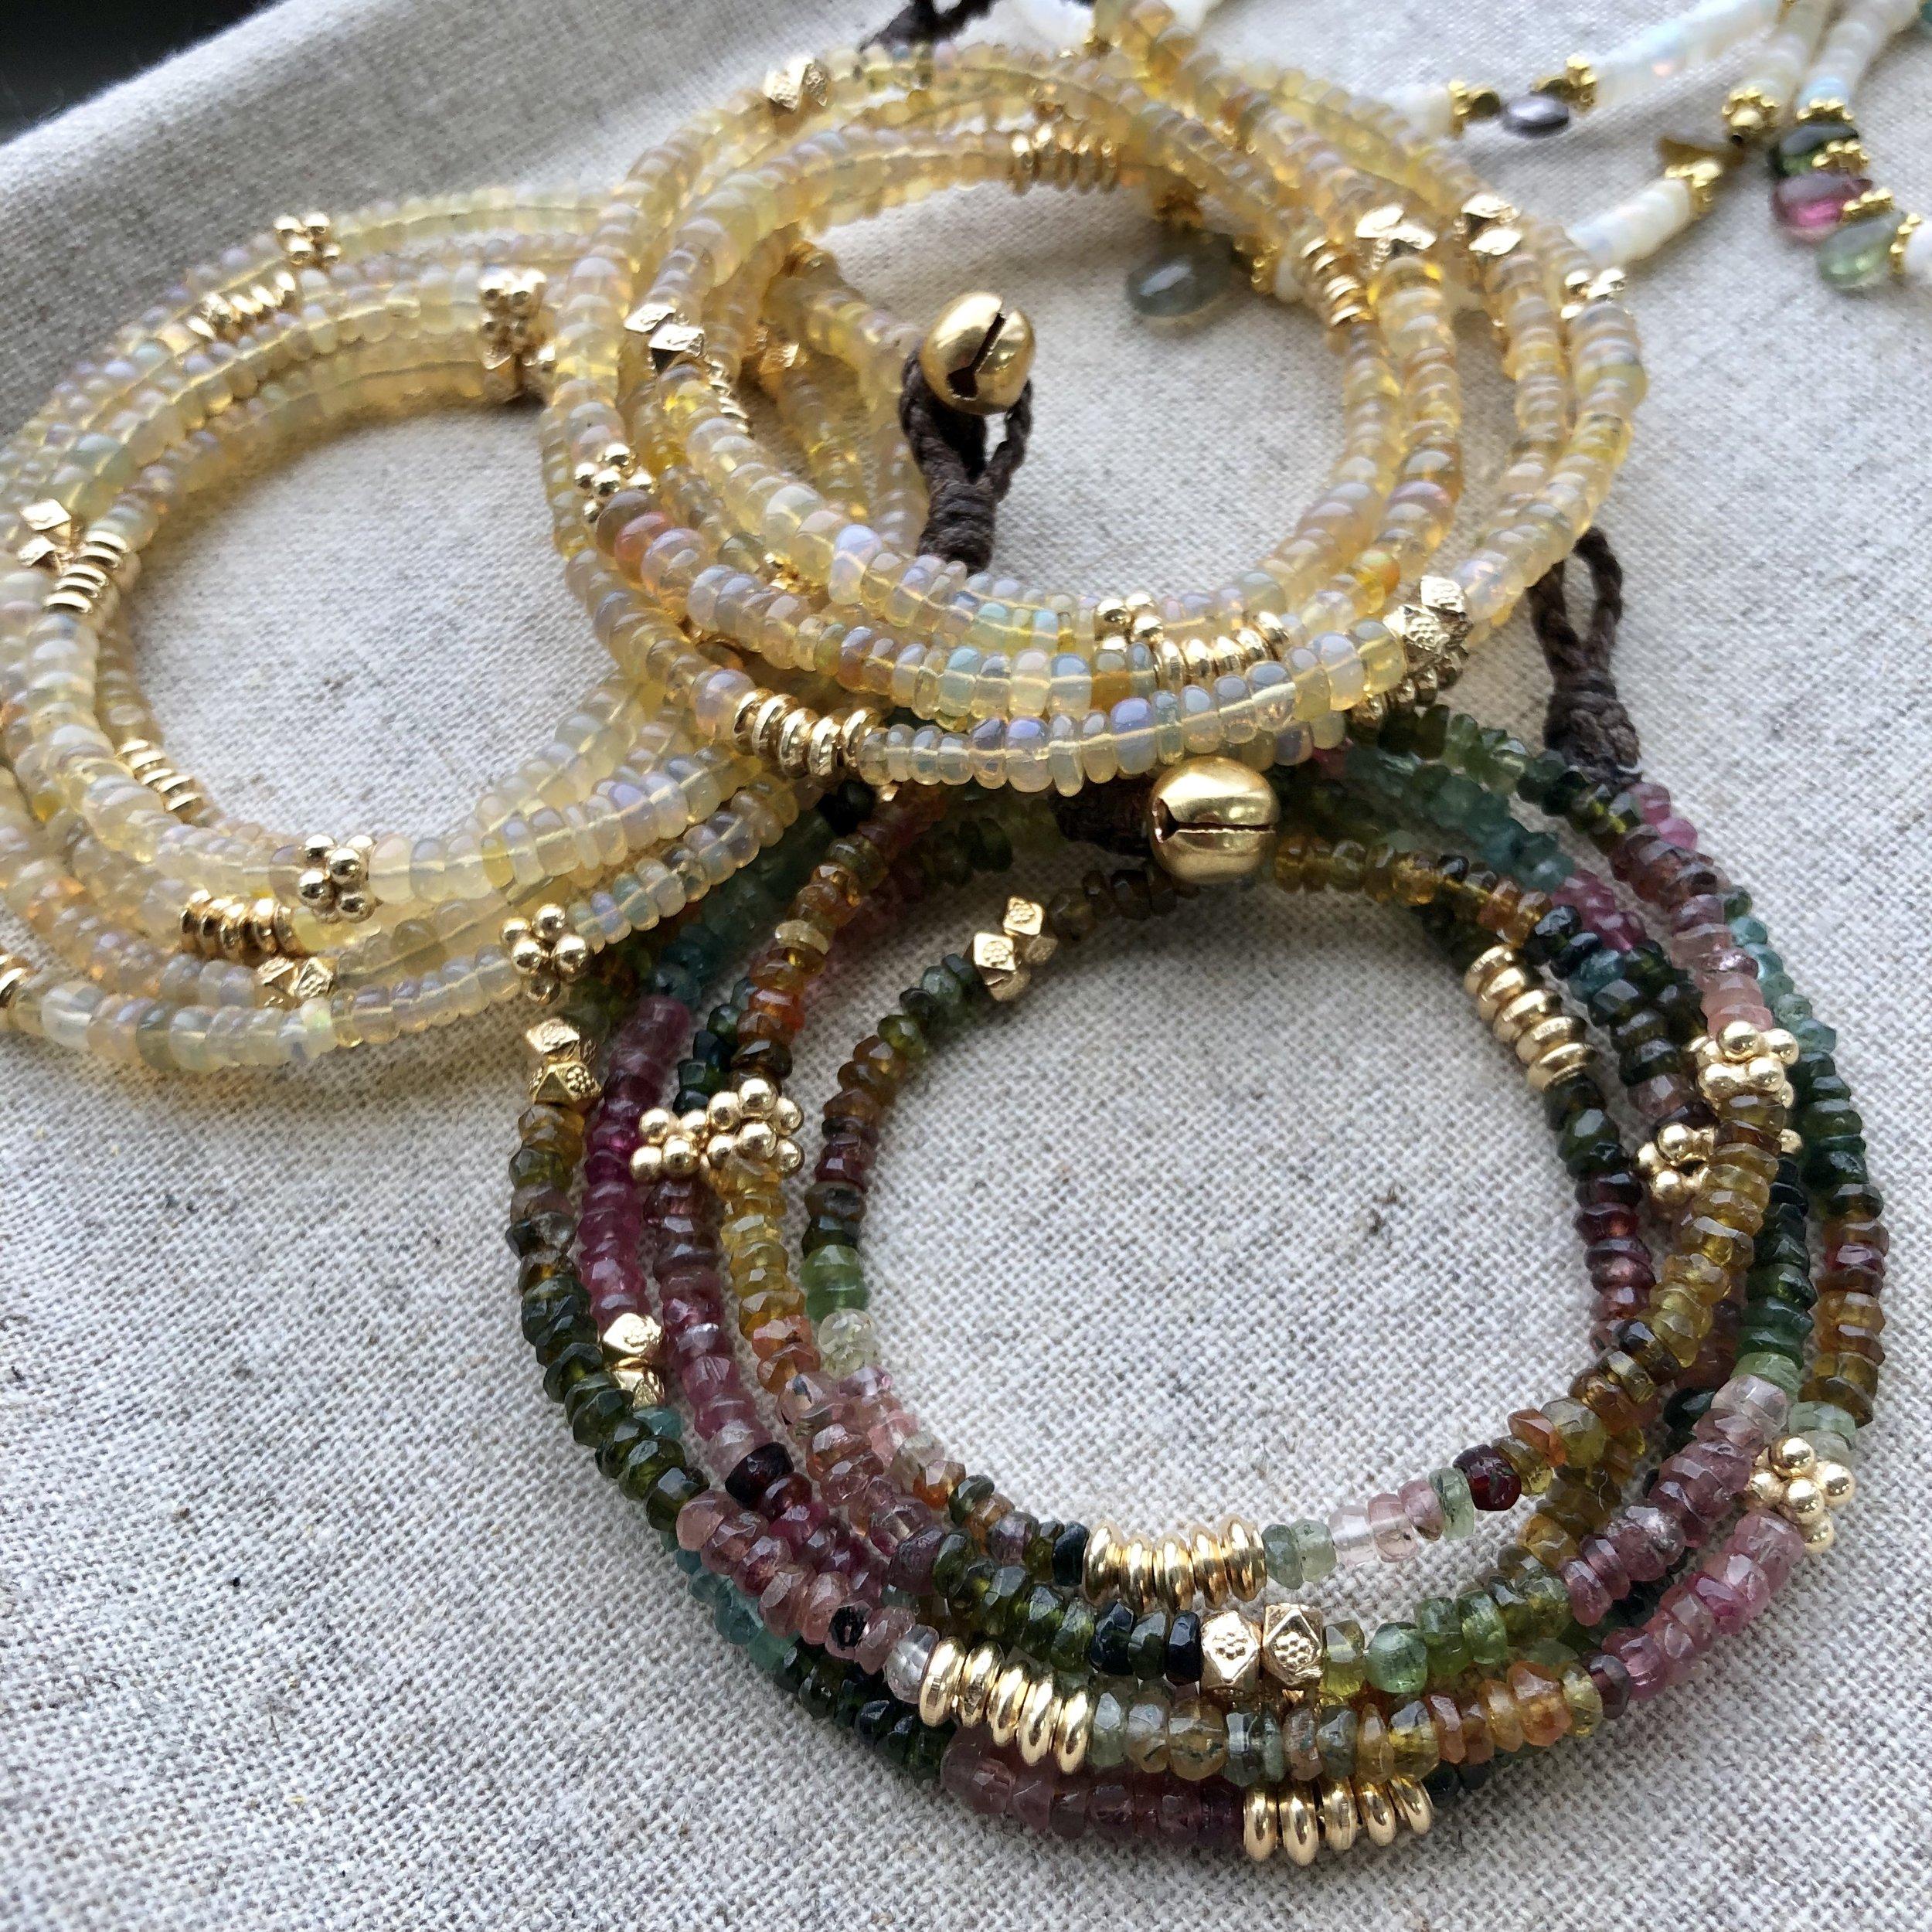 BAHAMAS tourmalines et opale jaune.jpg